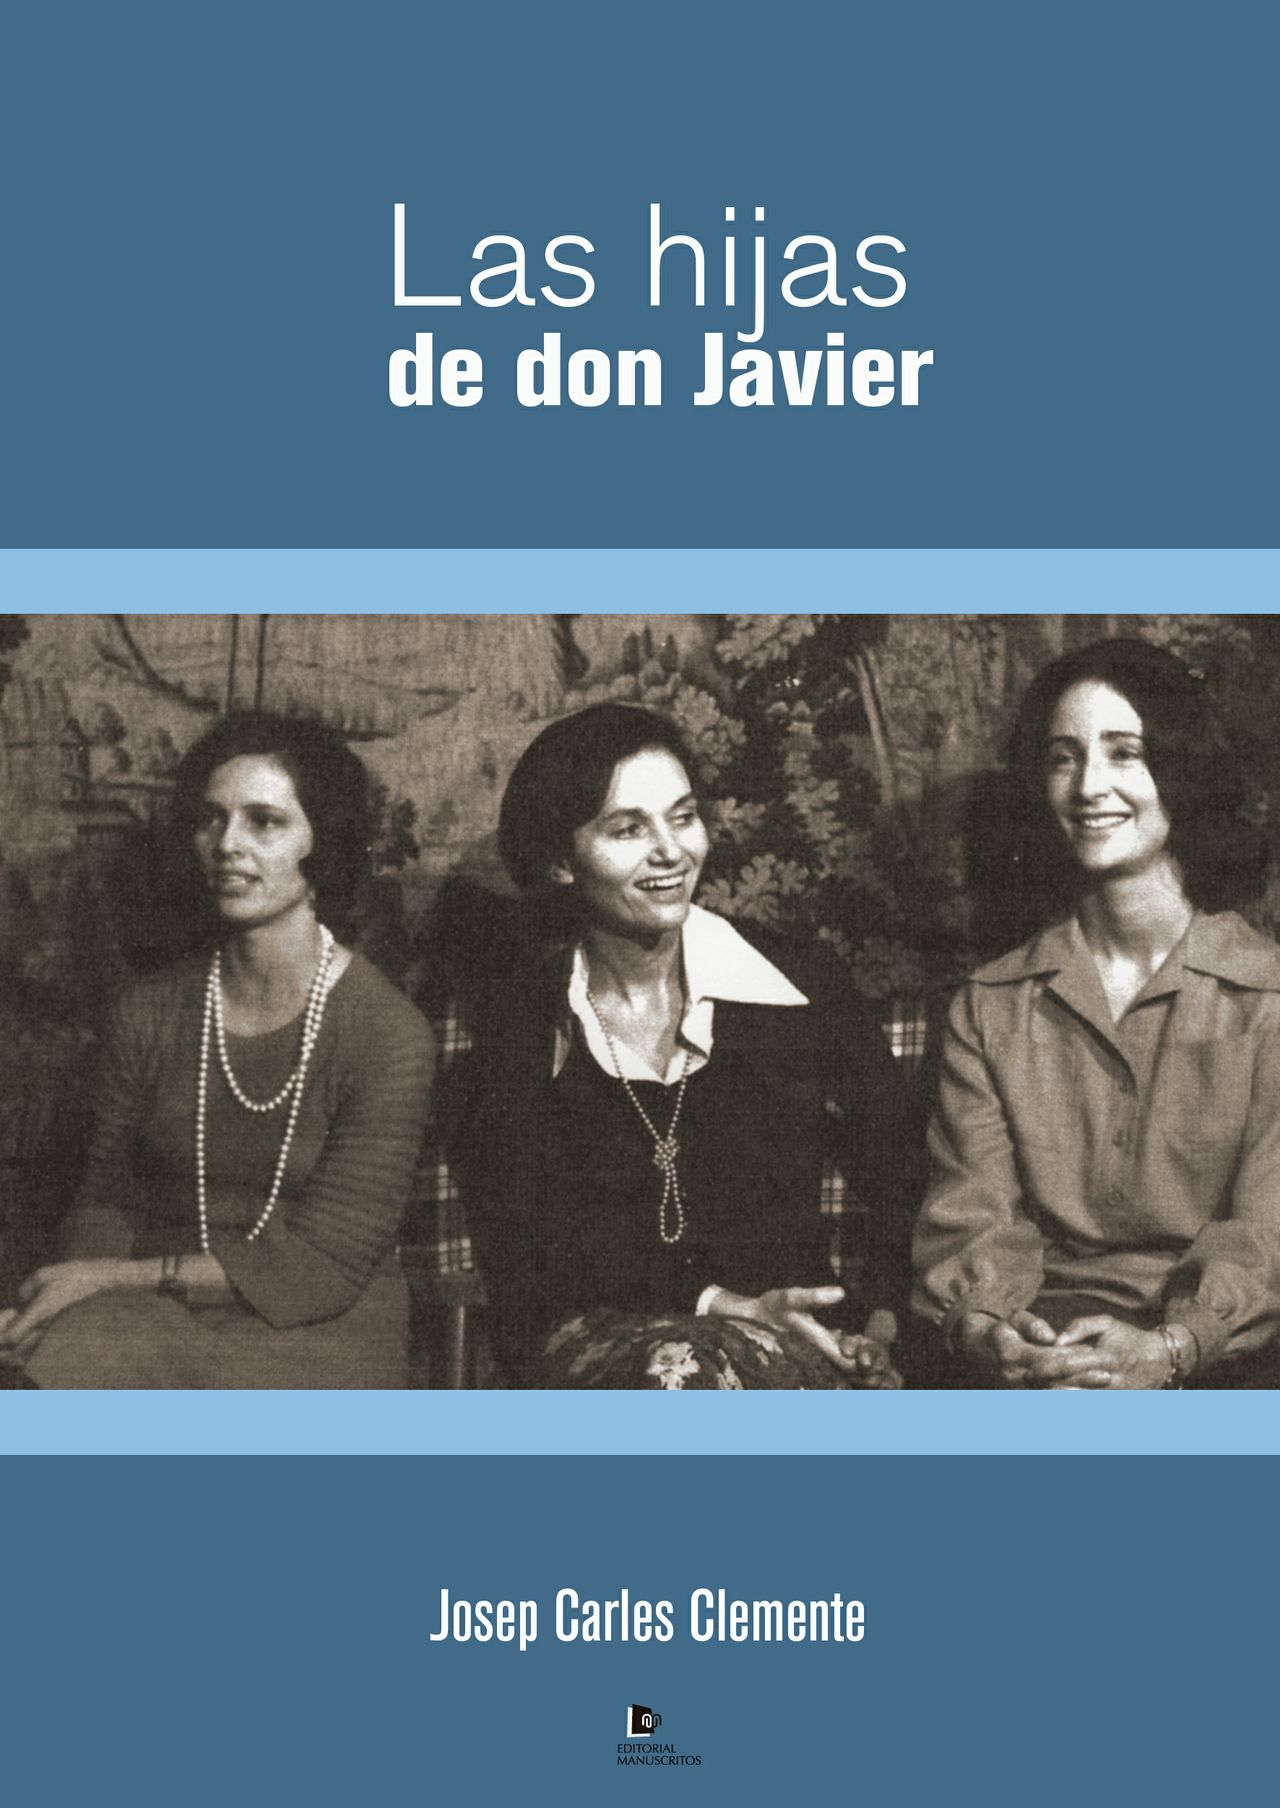 Las hijas de Don Javier - Josep Carles Clemente